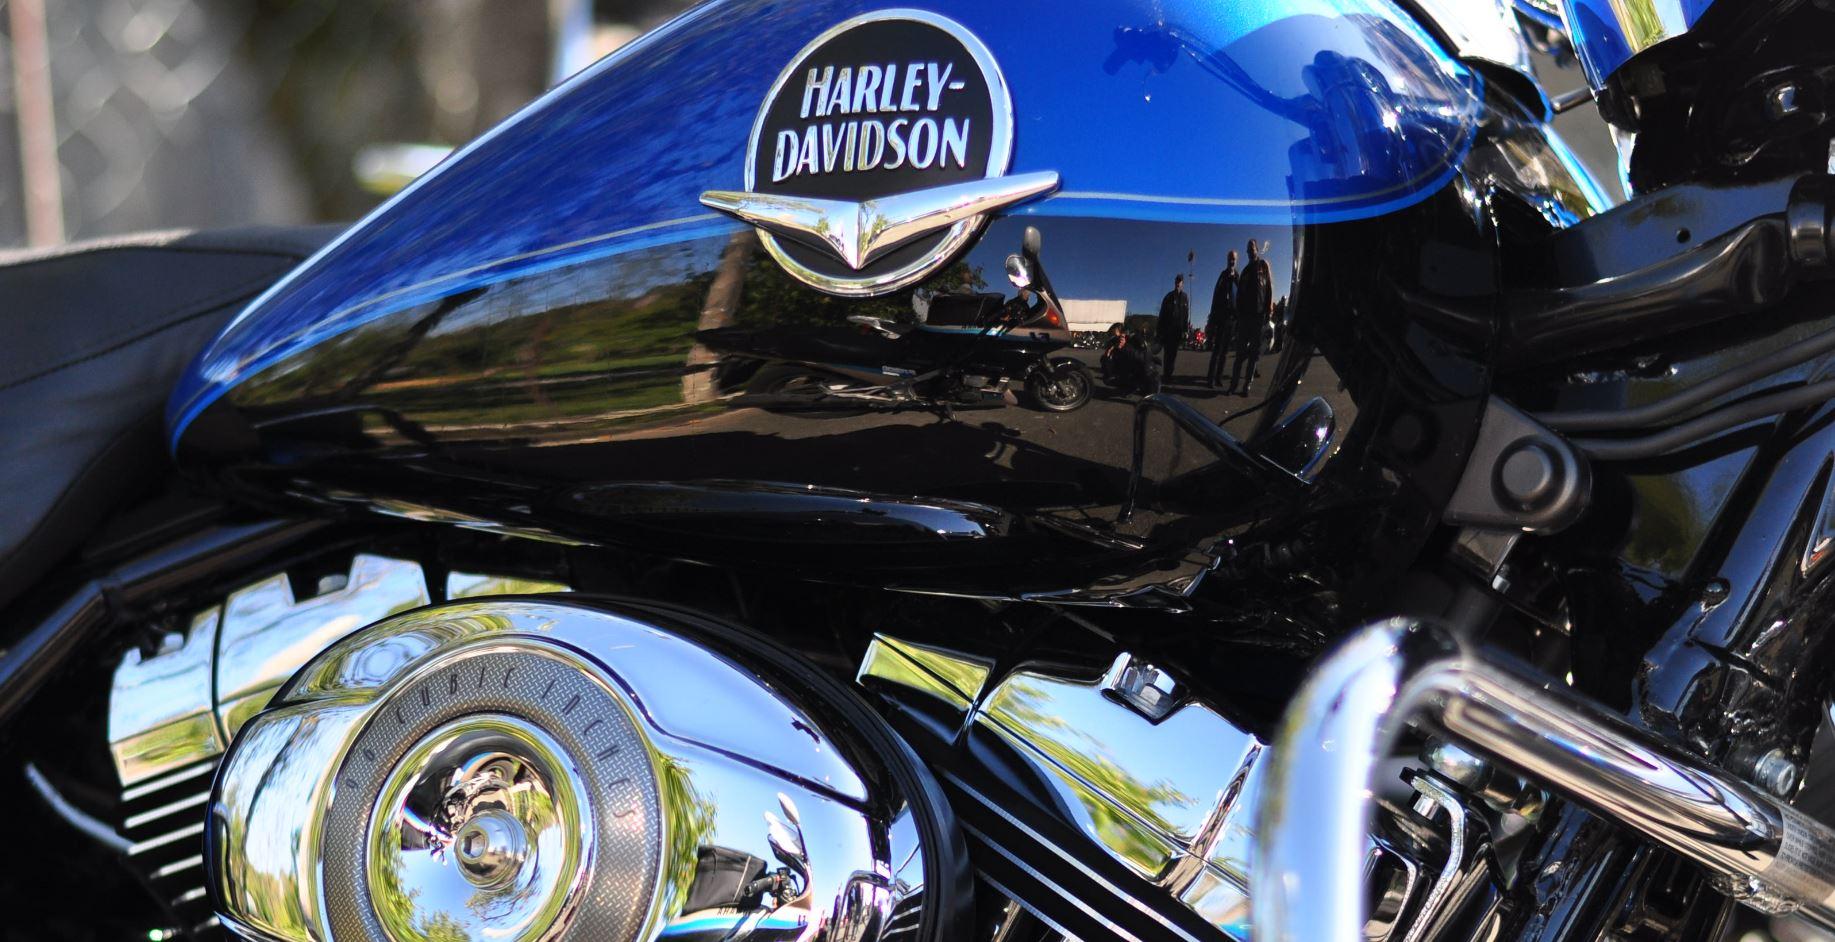 Harley Davidson - Fotografin im Tank